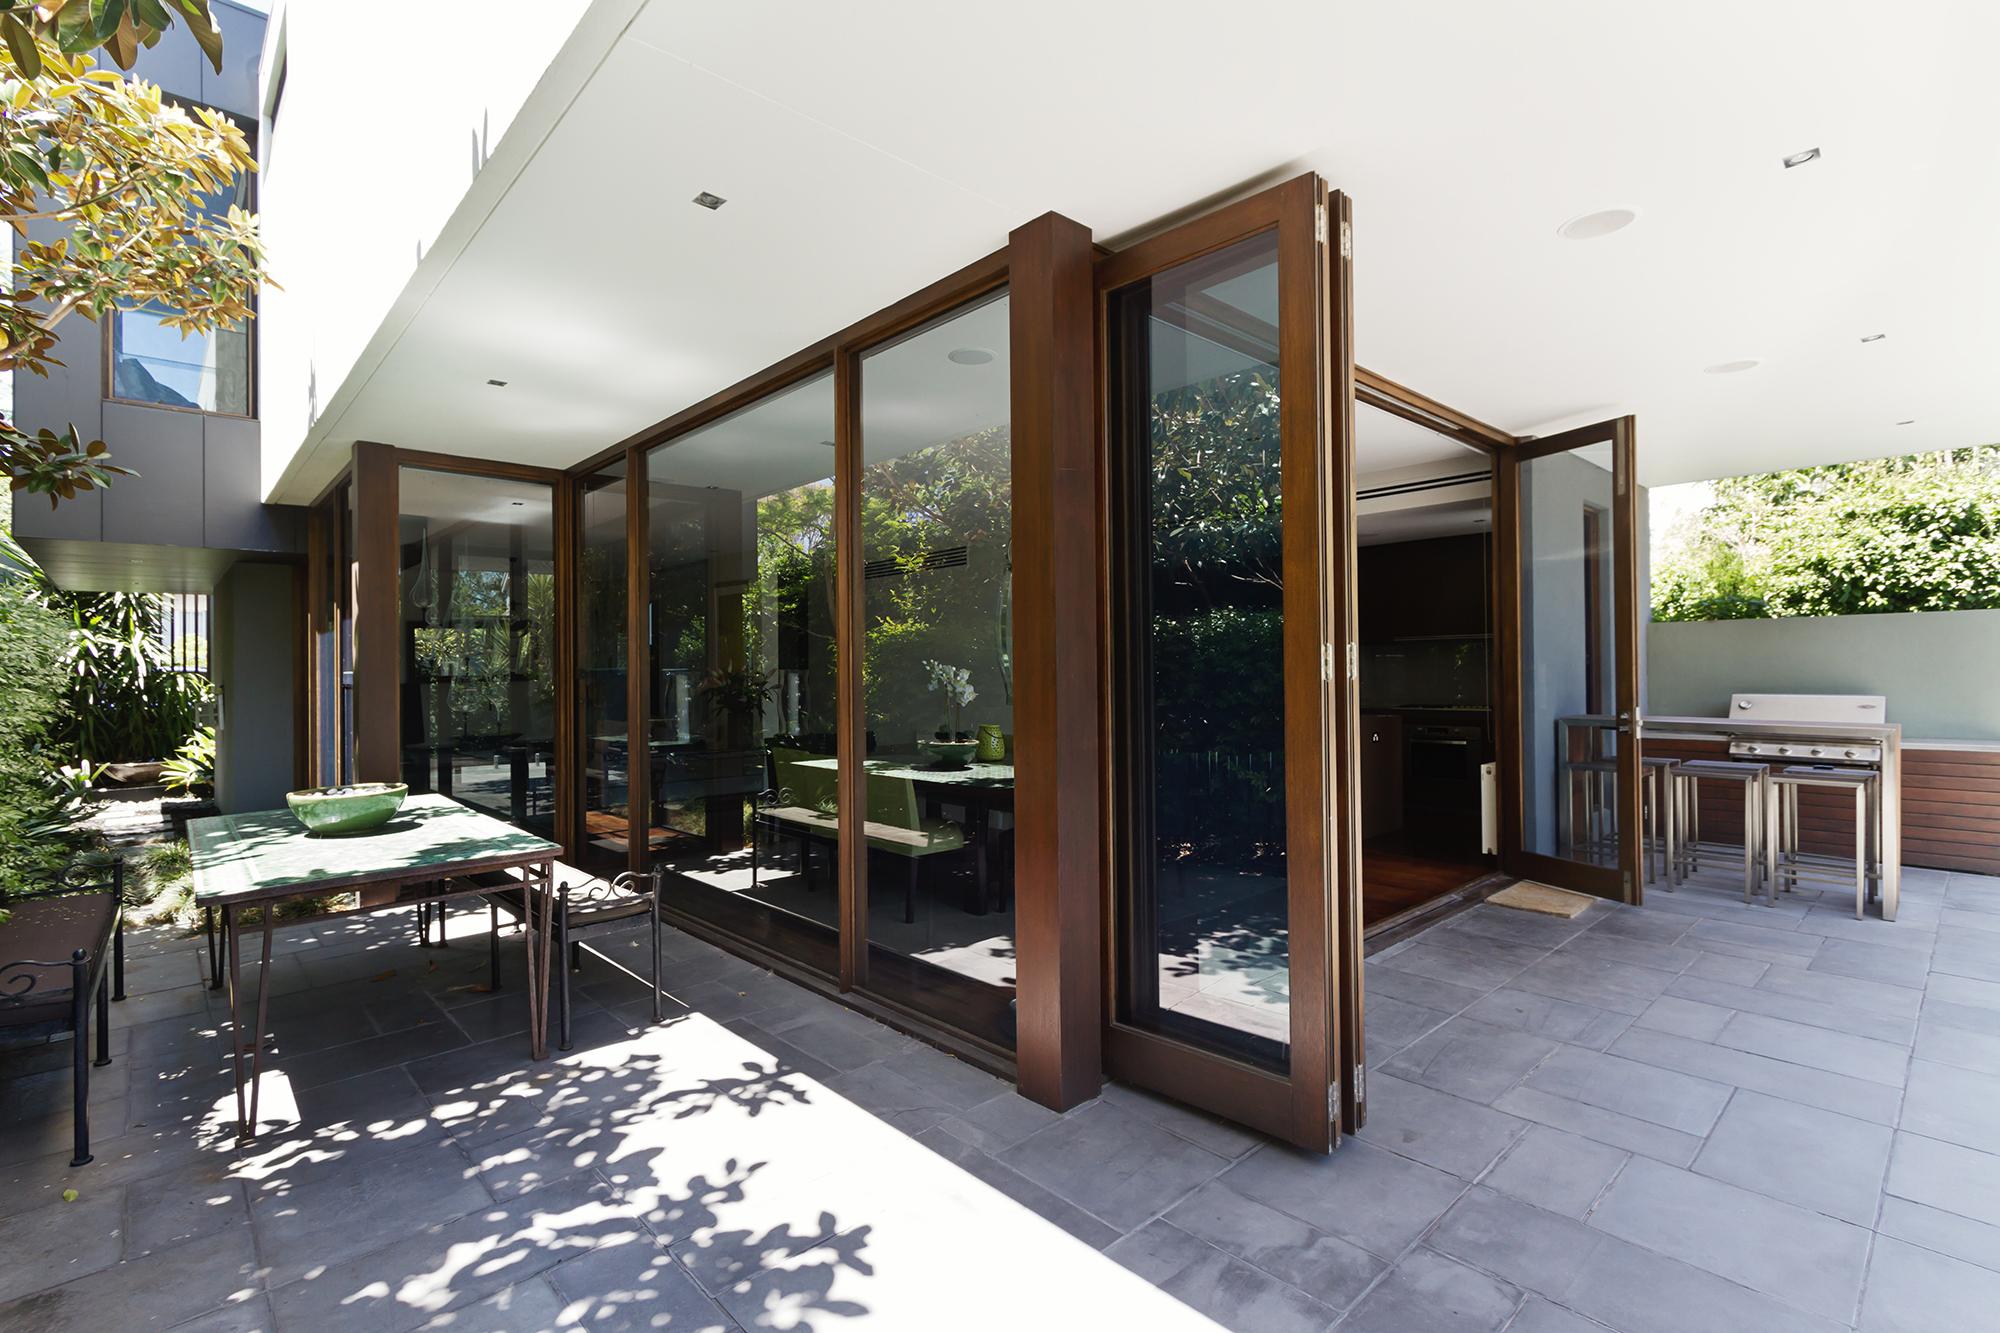 Tomma-Folding-Door-Systems-Patio.jpg